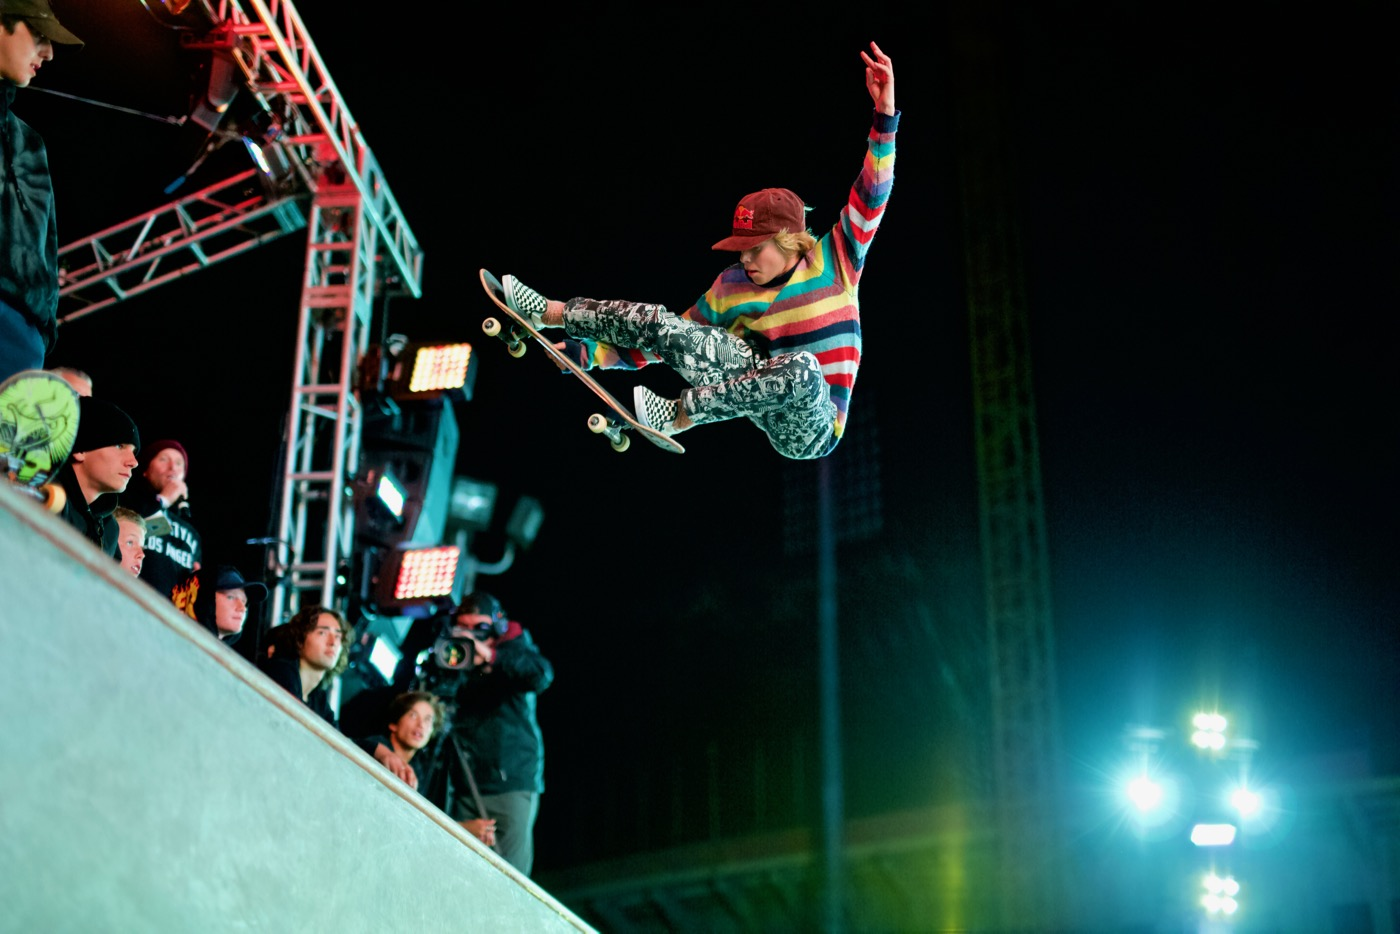 Skateboarding Tricks @ Air + Style 2018. Photo by Derrick K. Lee, Esq. (@Methodman13) for www.BlurredCulture.com.